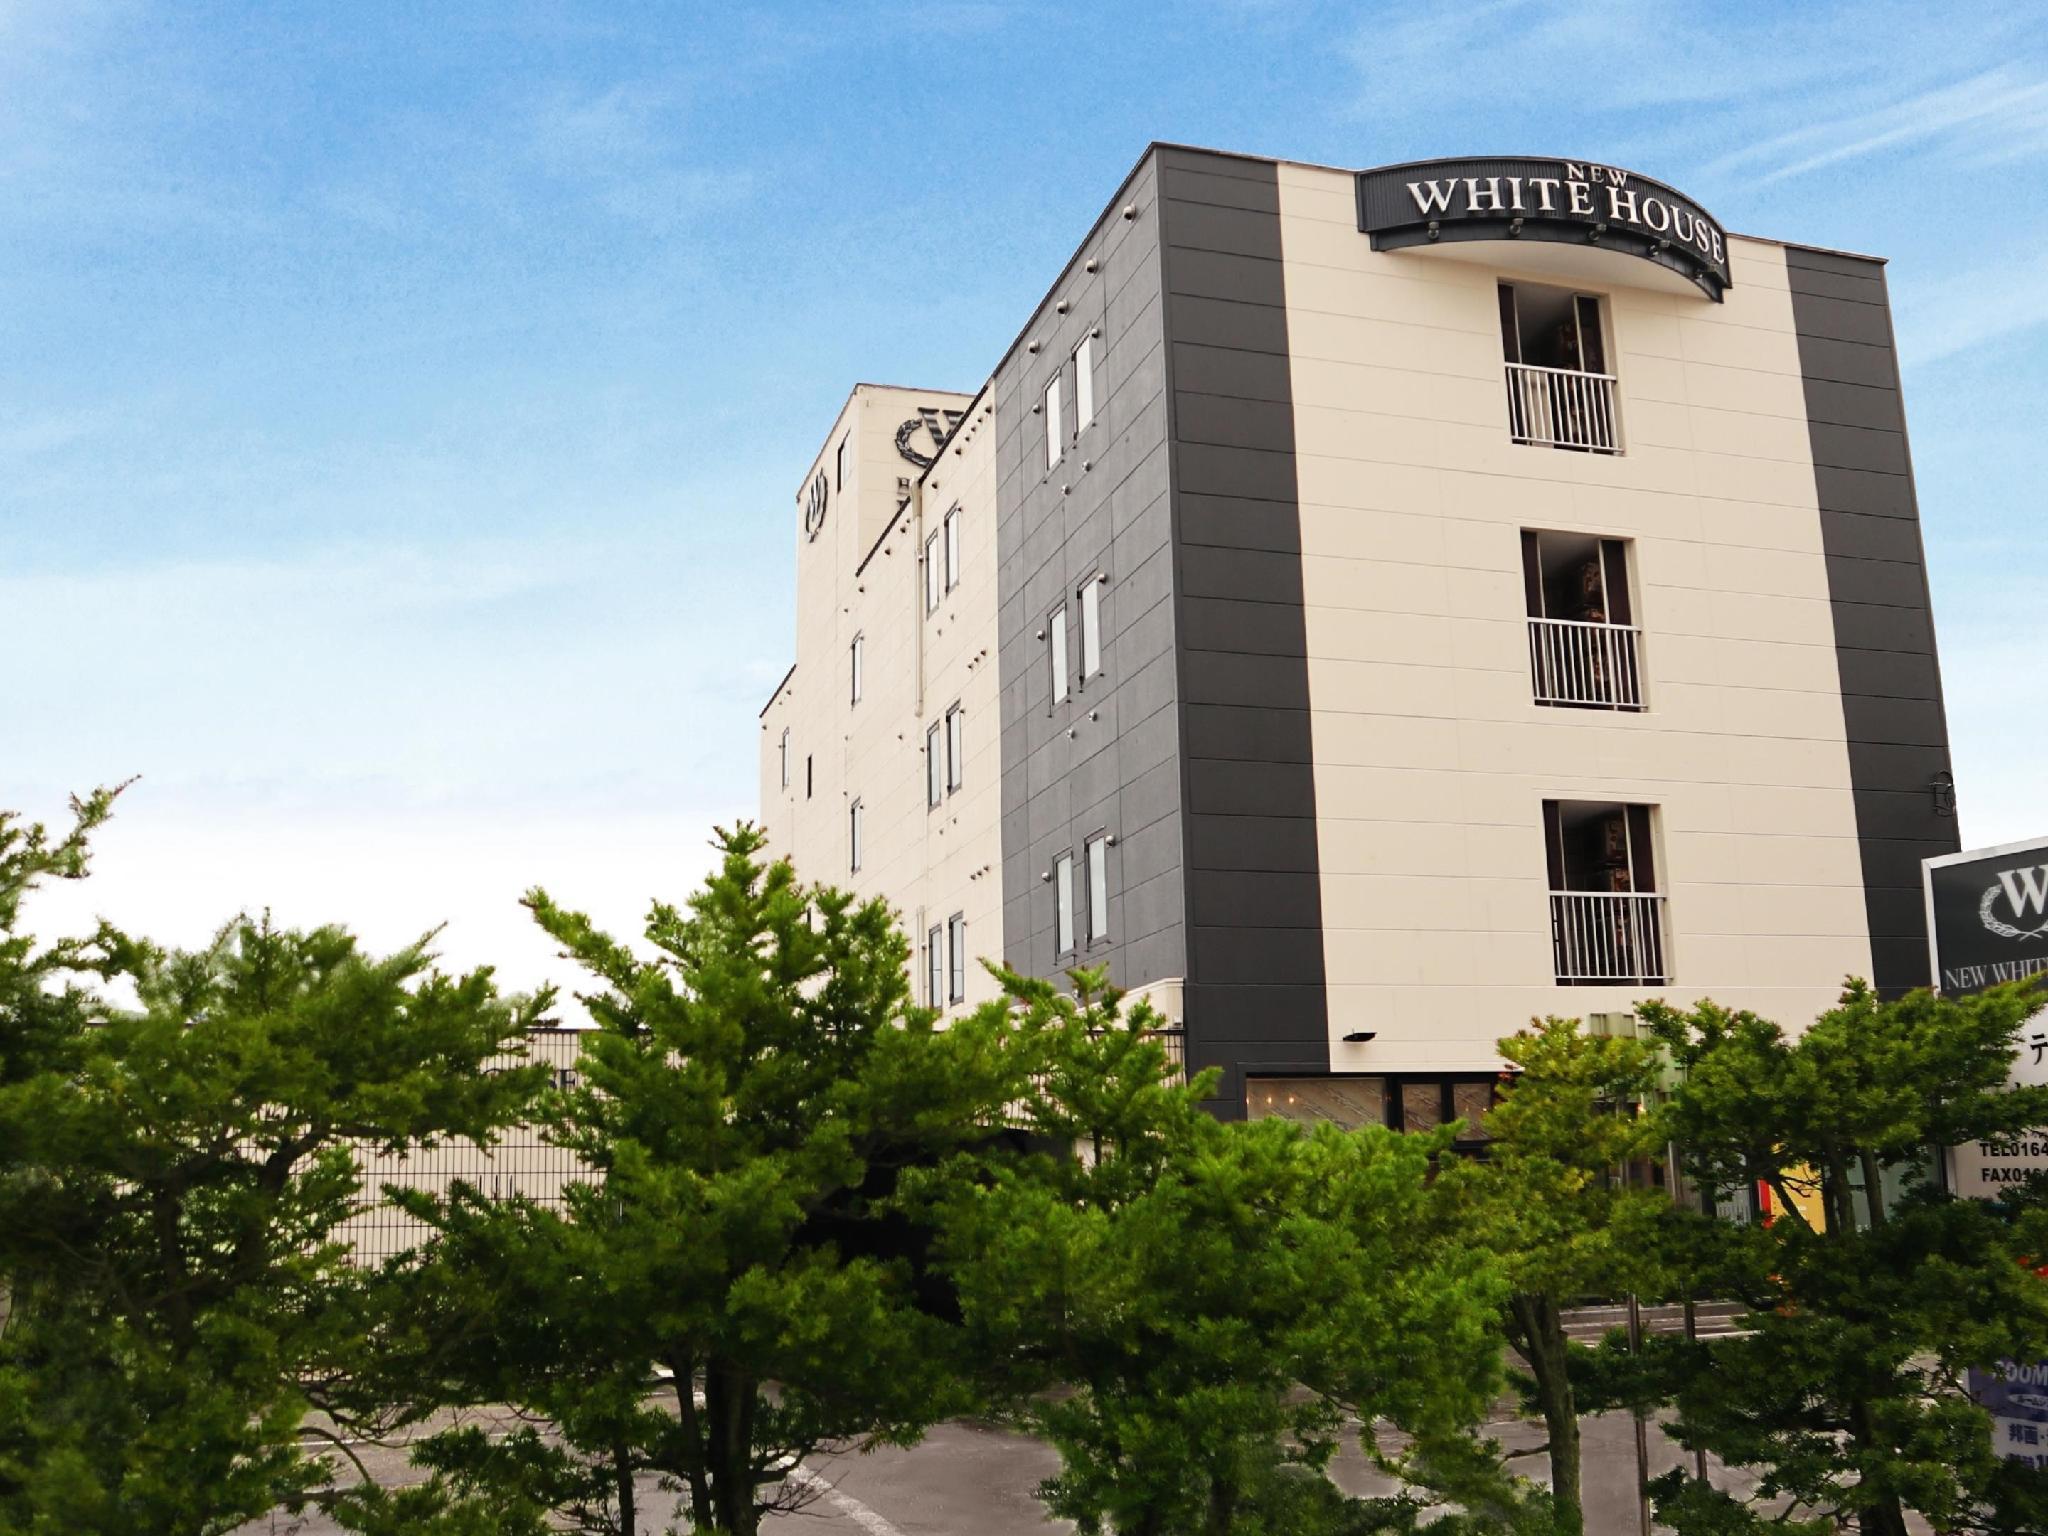 Hotel New White House